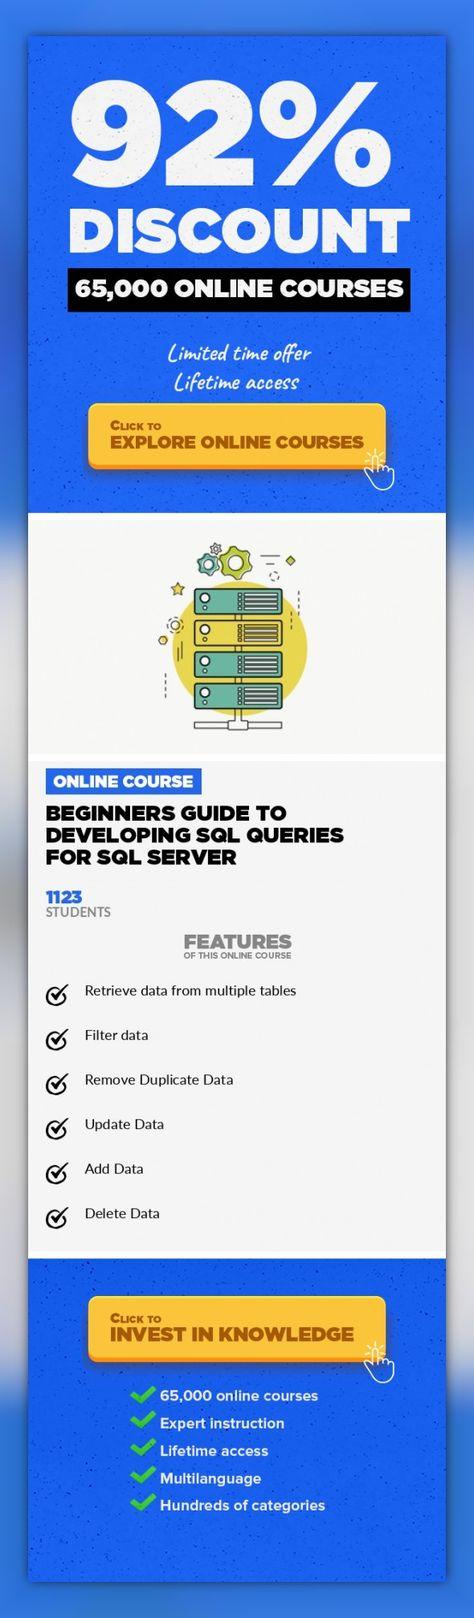 Learning sql server development on linux.